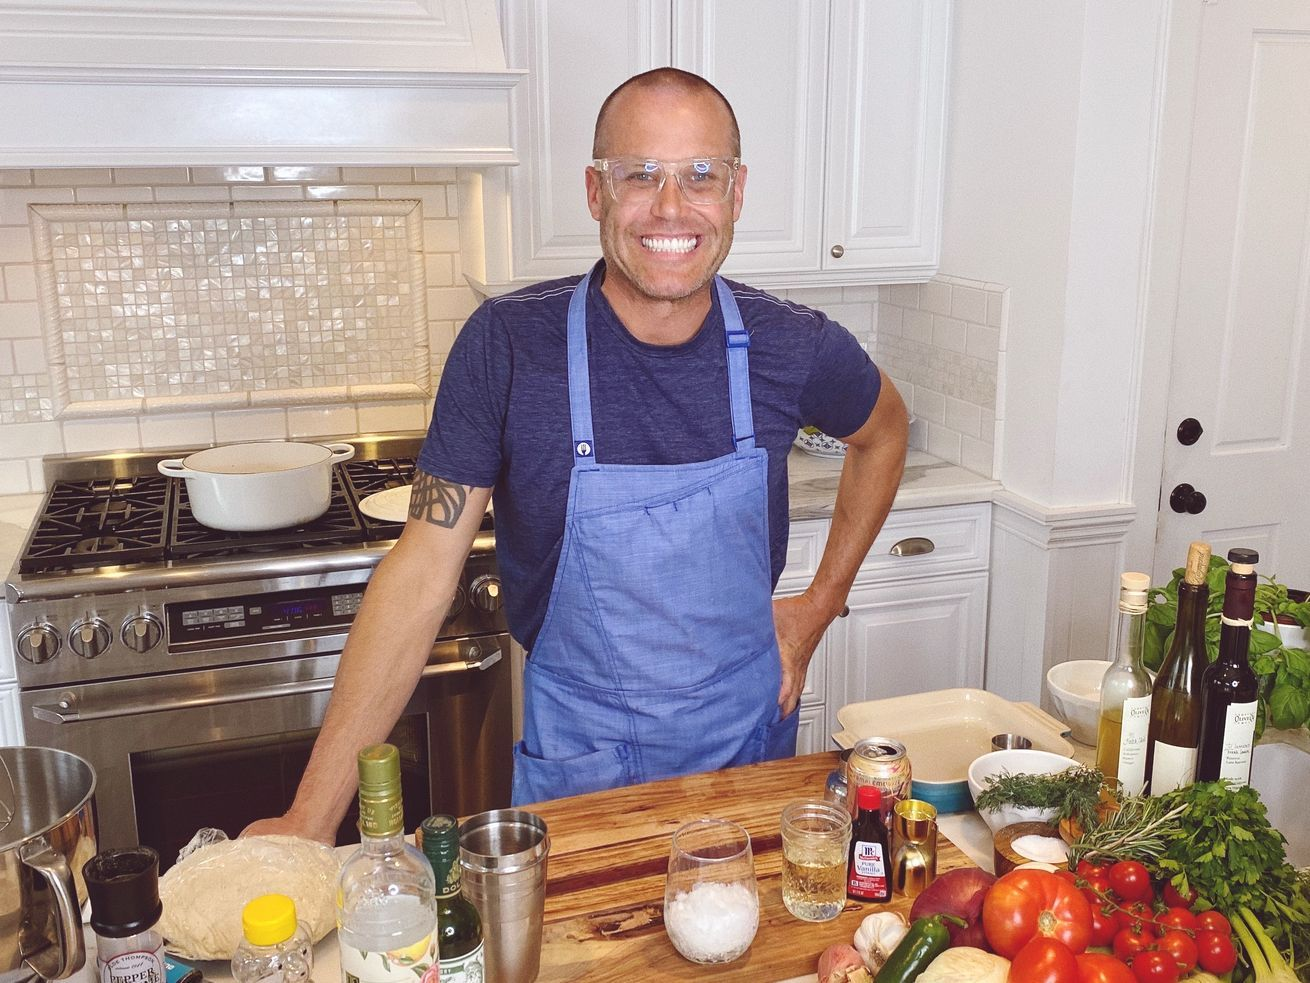 Brian Malarkey To Host Virtual Cooking Classes Cooking Classes Cooking Asian Street Food